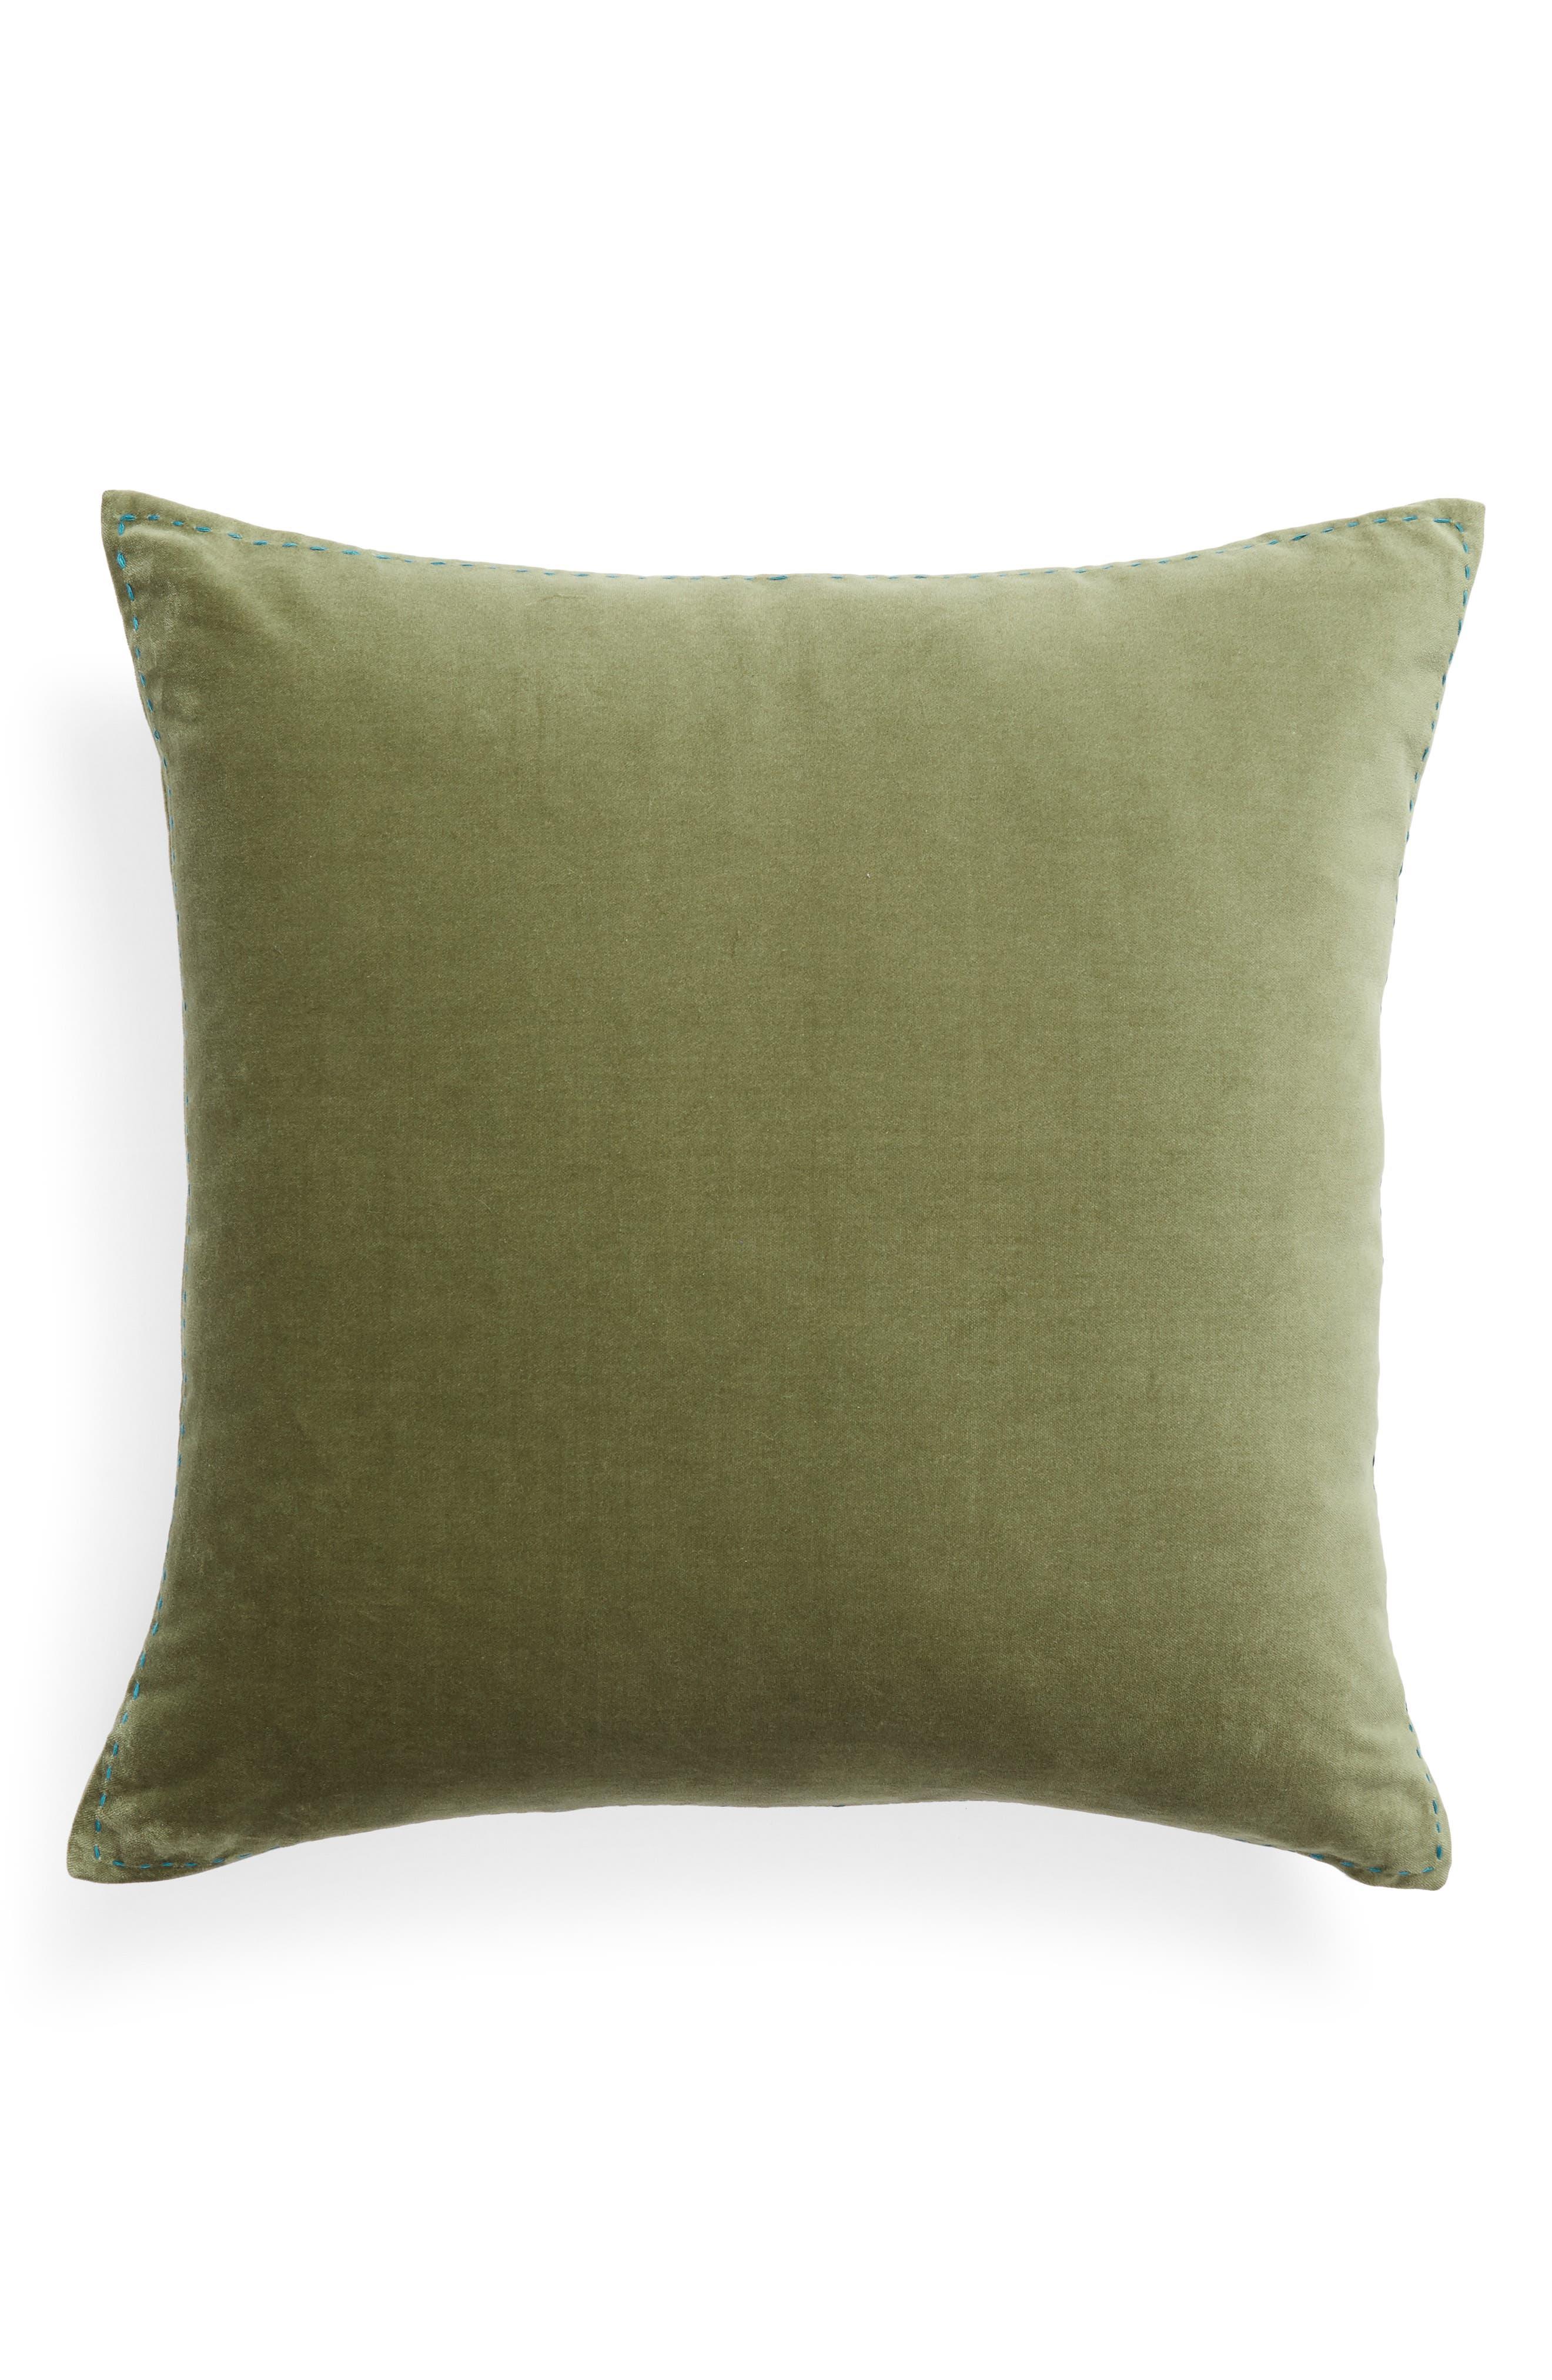 Ticking Border Accent Pillow,                             Alternate thumbnail 2, color,                             300